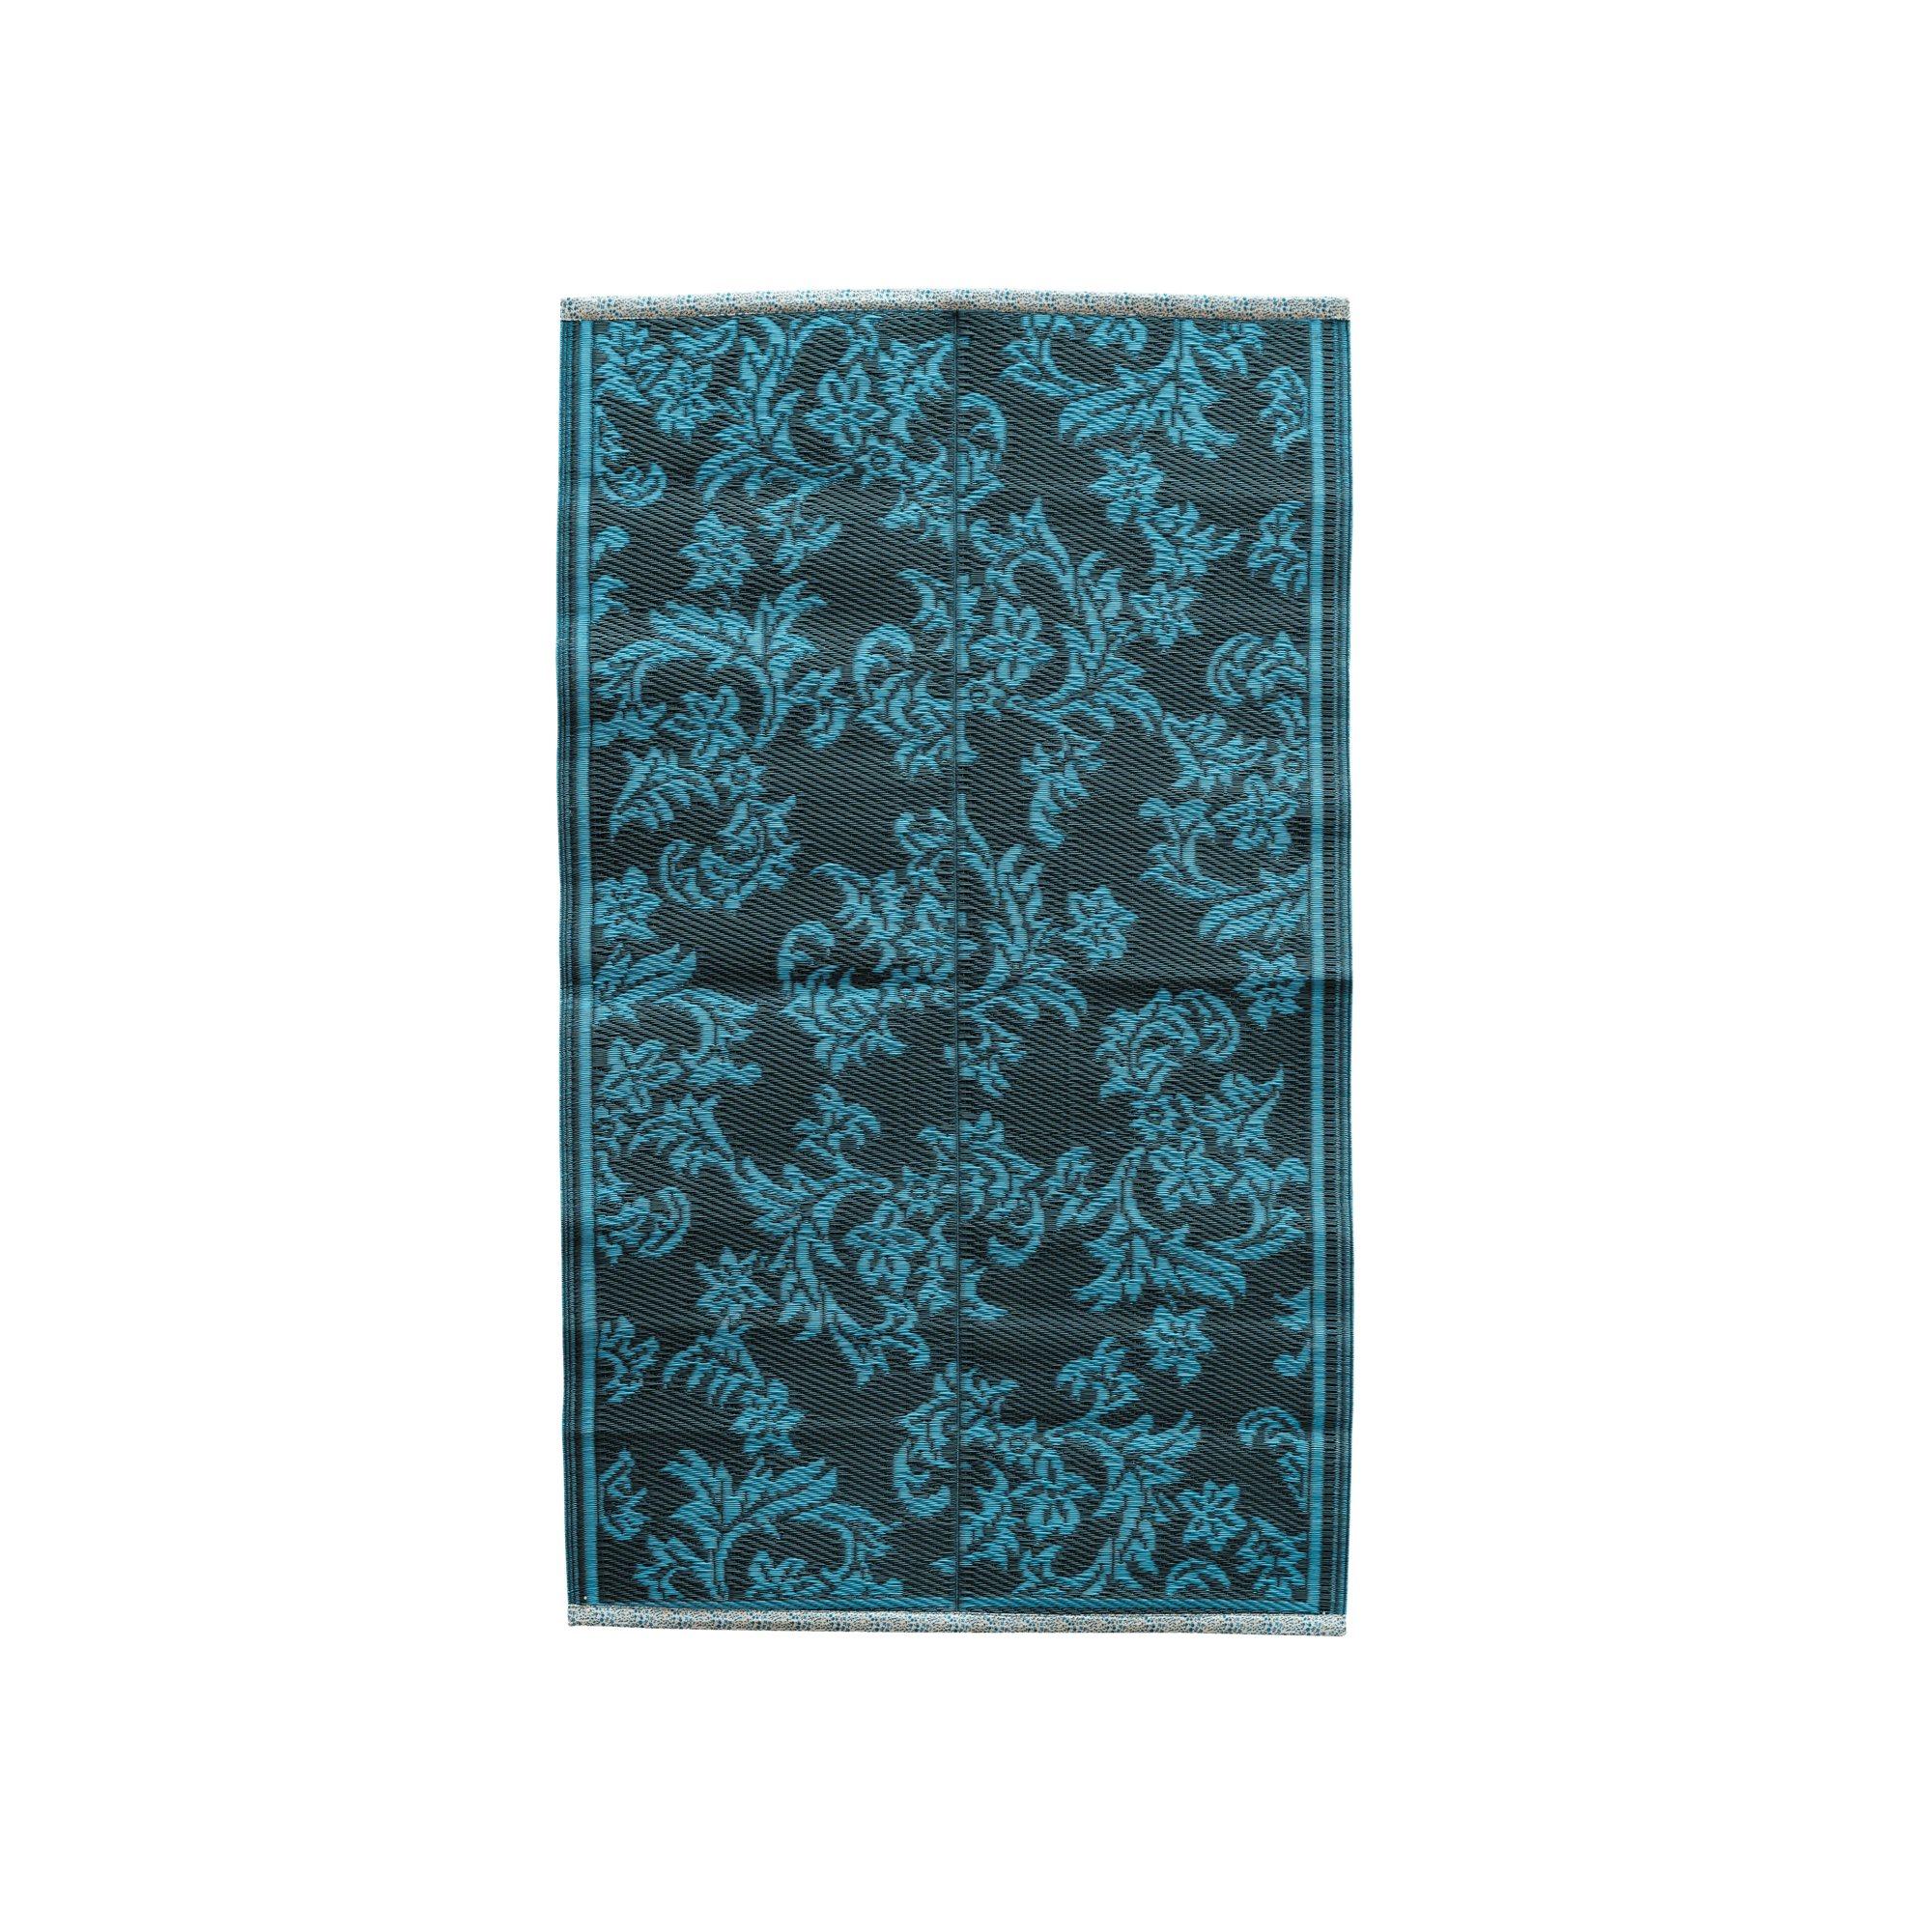 Rice - Plastic Floor Mat w. Flower Design -  Dark Grey & Dusty Blue